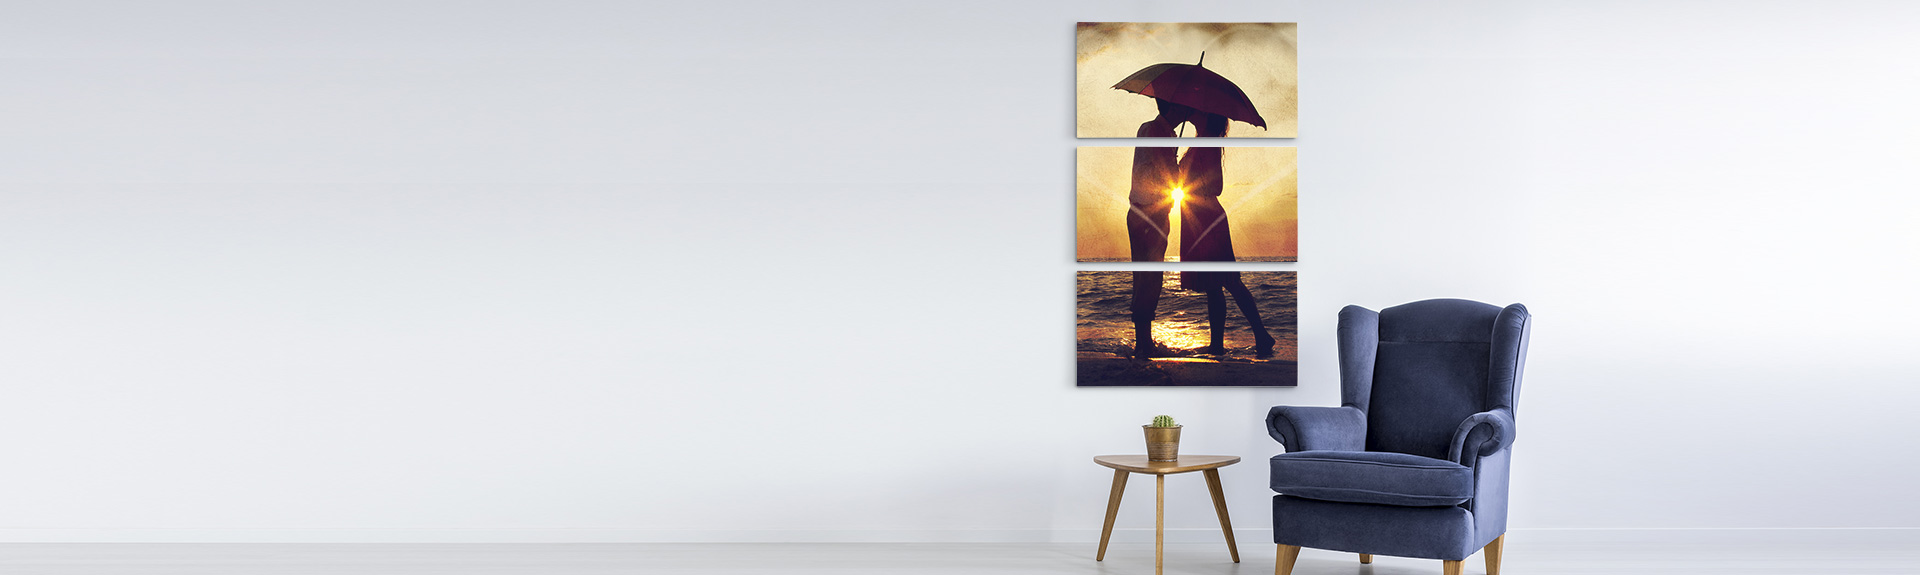 Multi Canvas Wall Display